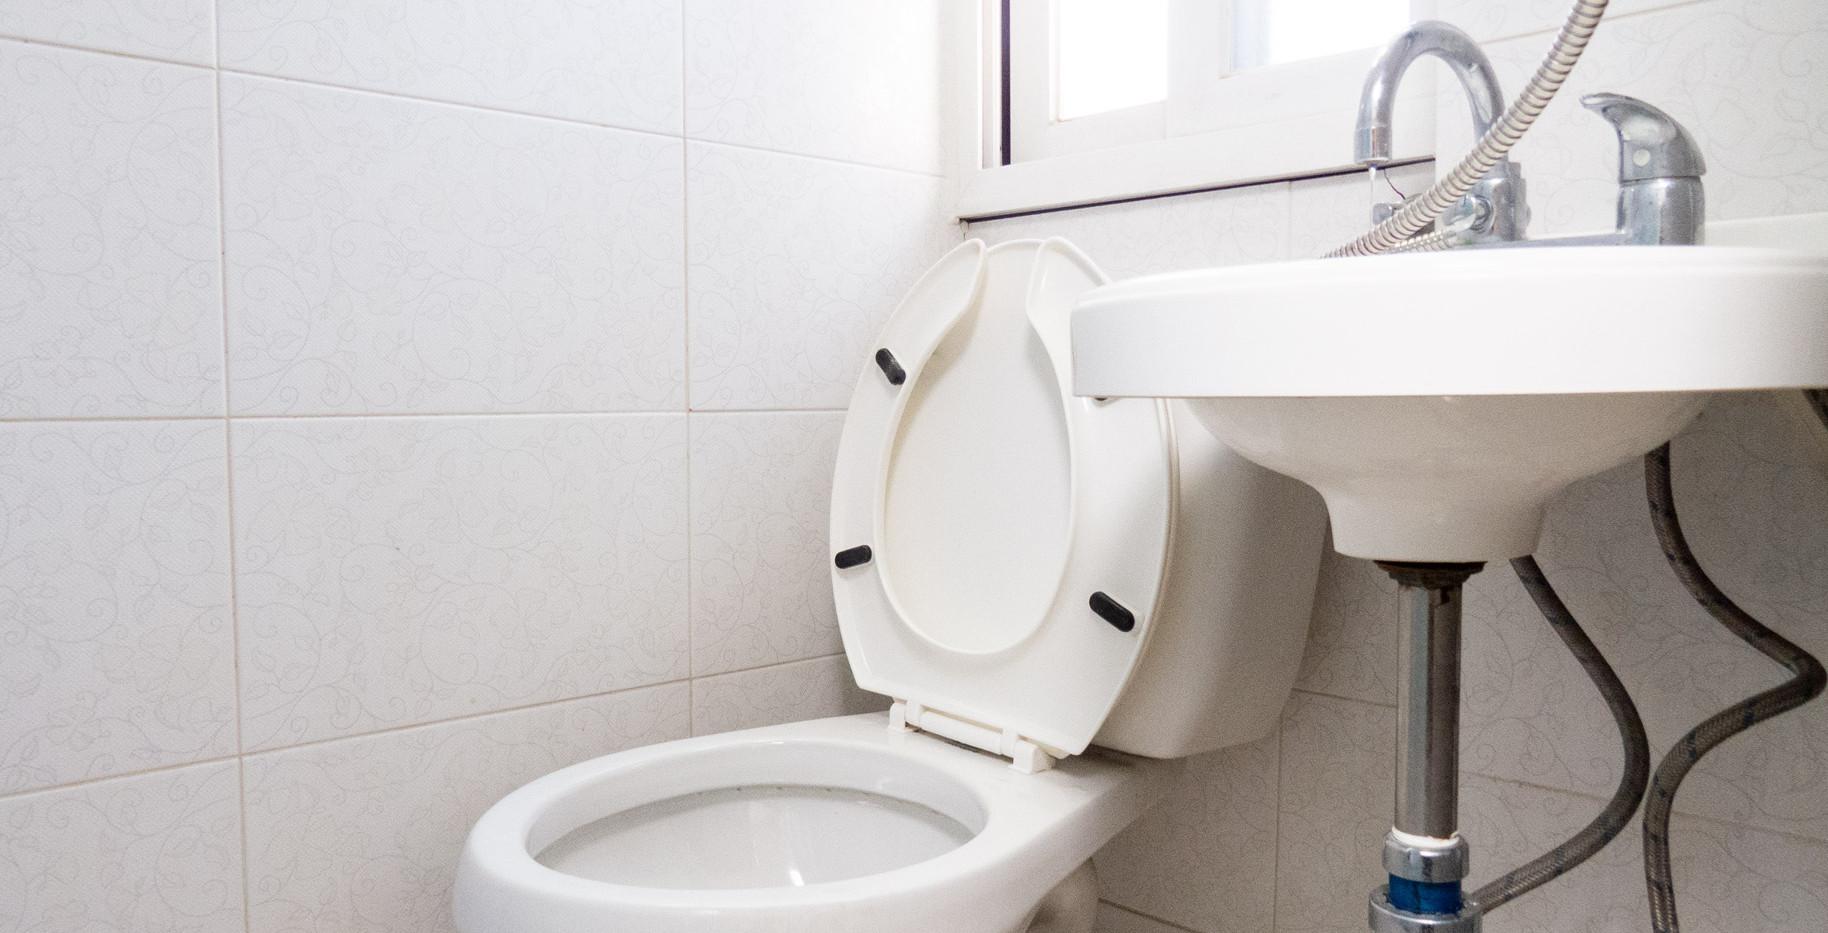 Standard A bathroom